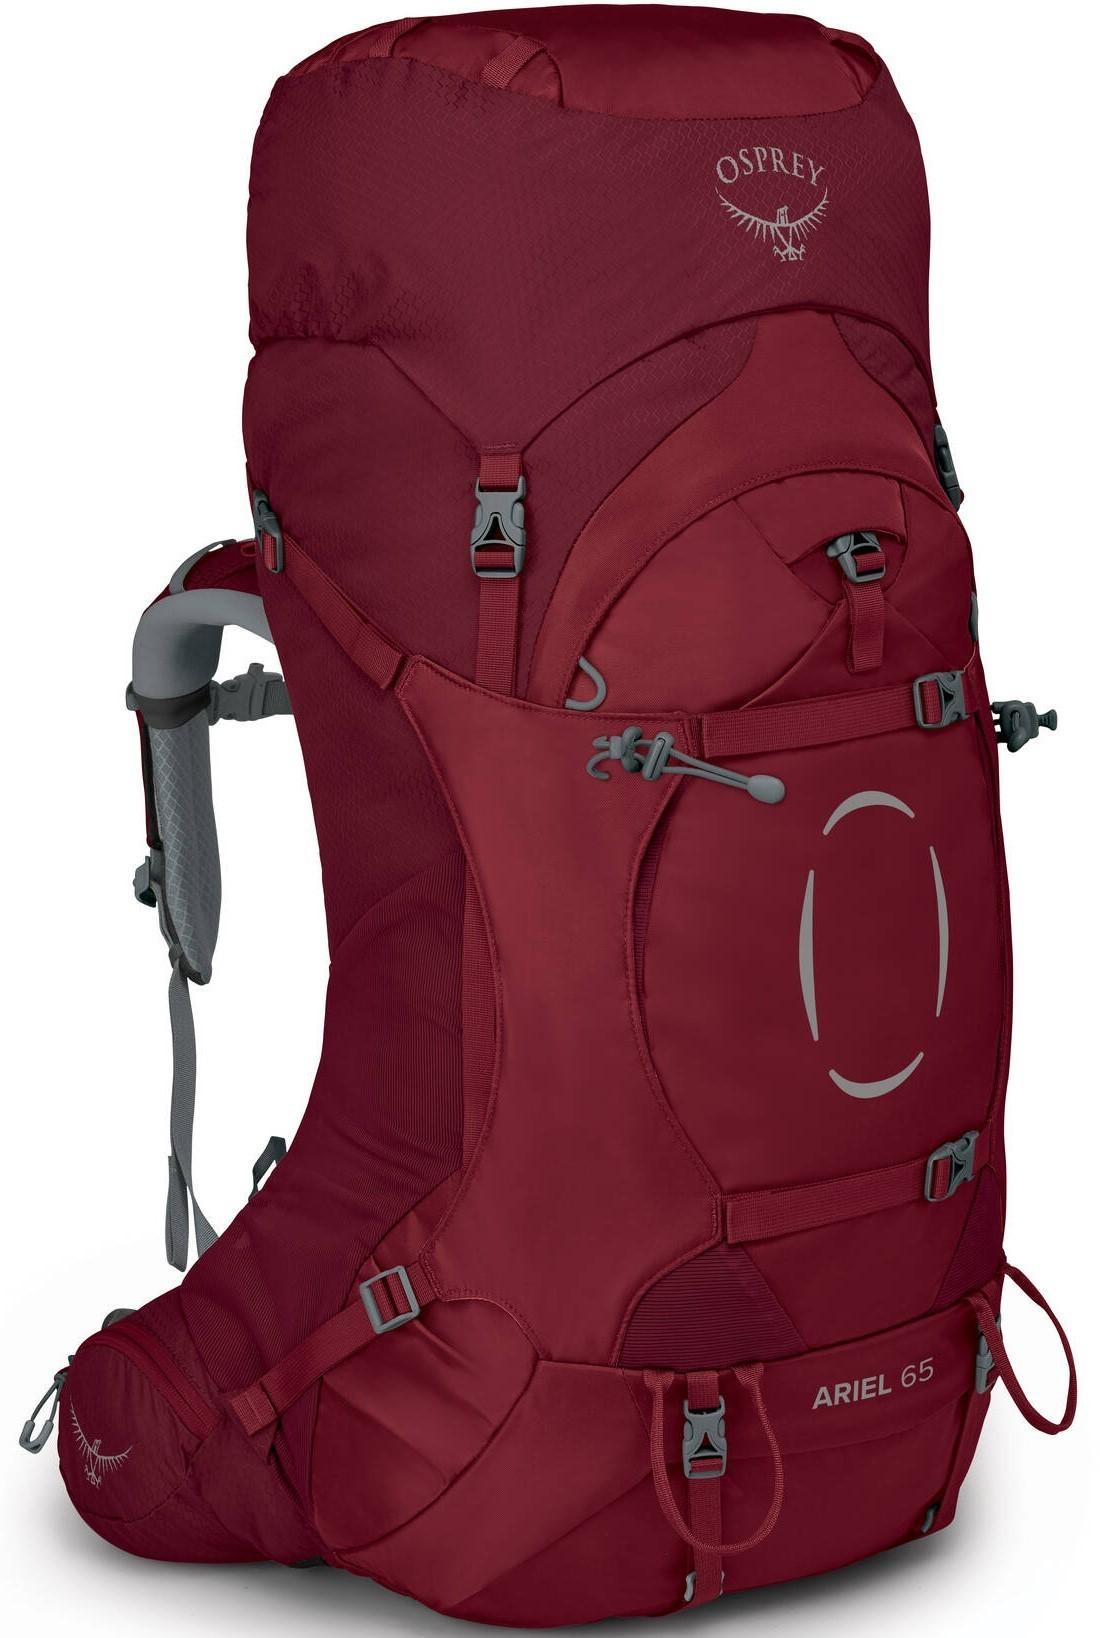 Туристические рюкзаки Рюкзак женский туристический Osprey Ariel 65 Claret Red Ariel_65_S21_Side_Claret_Red_web.jpg